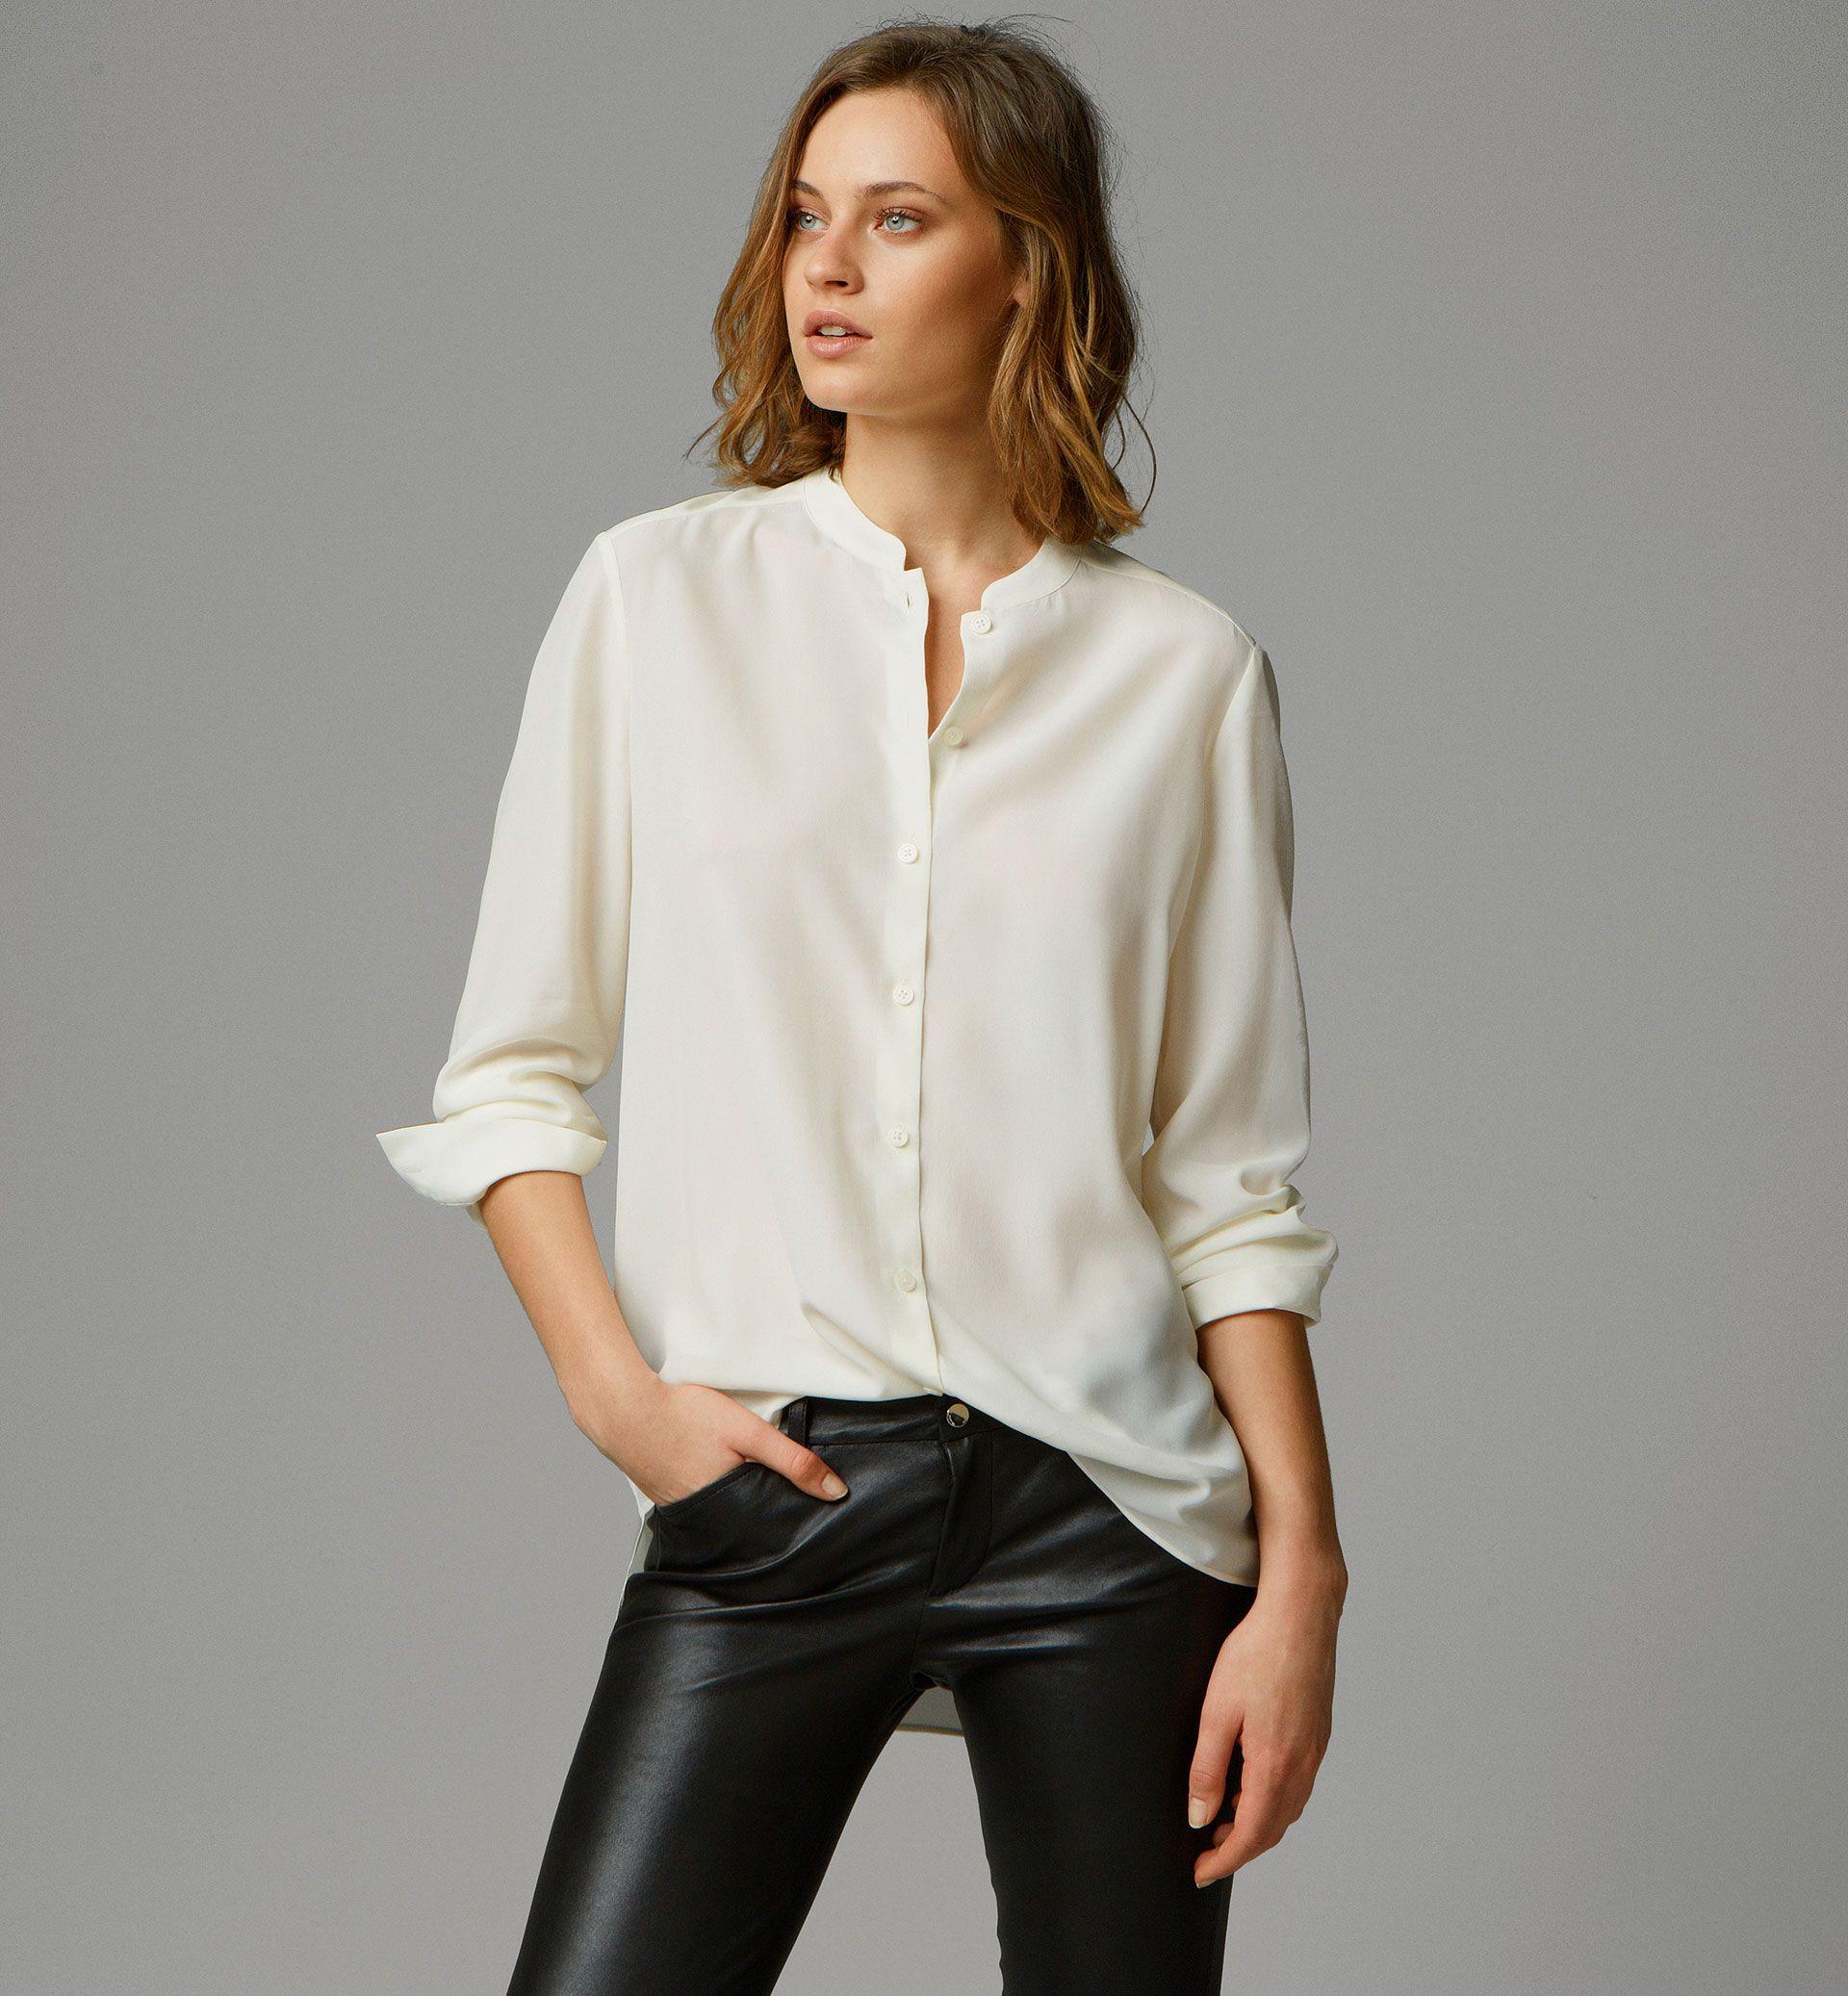 11165b41de MANDARIN COLLAR SHIRT - View all - Shirts & Blouses - WOMEN - United Kingdom